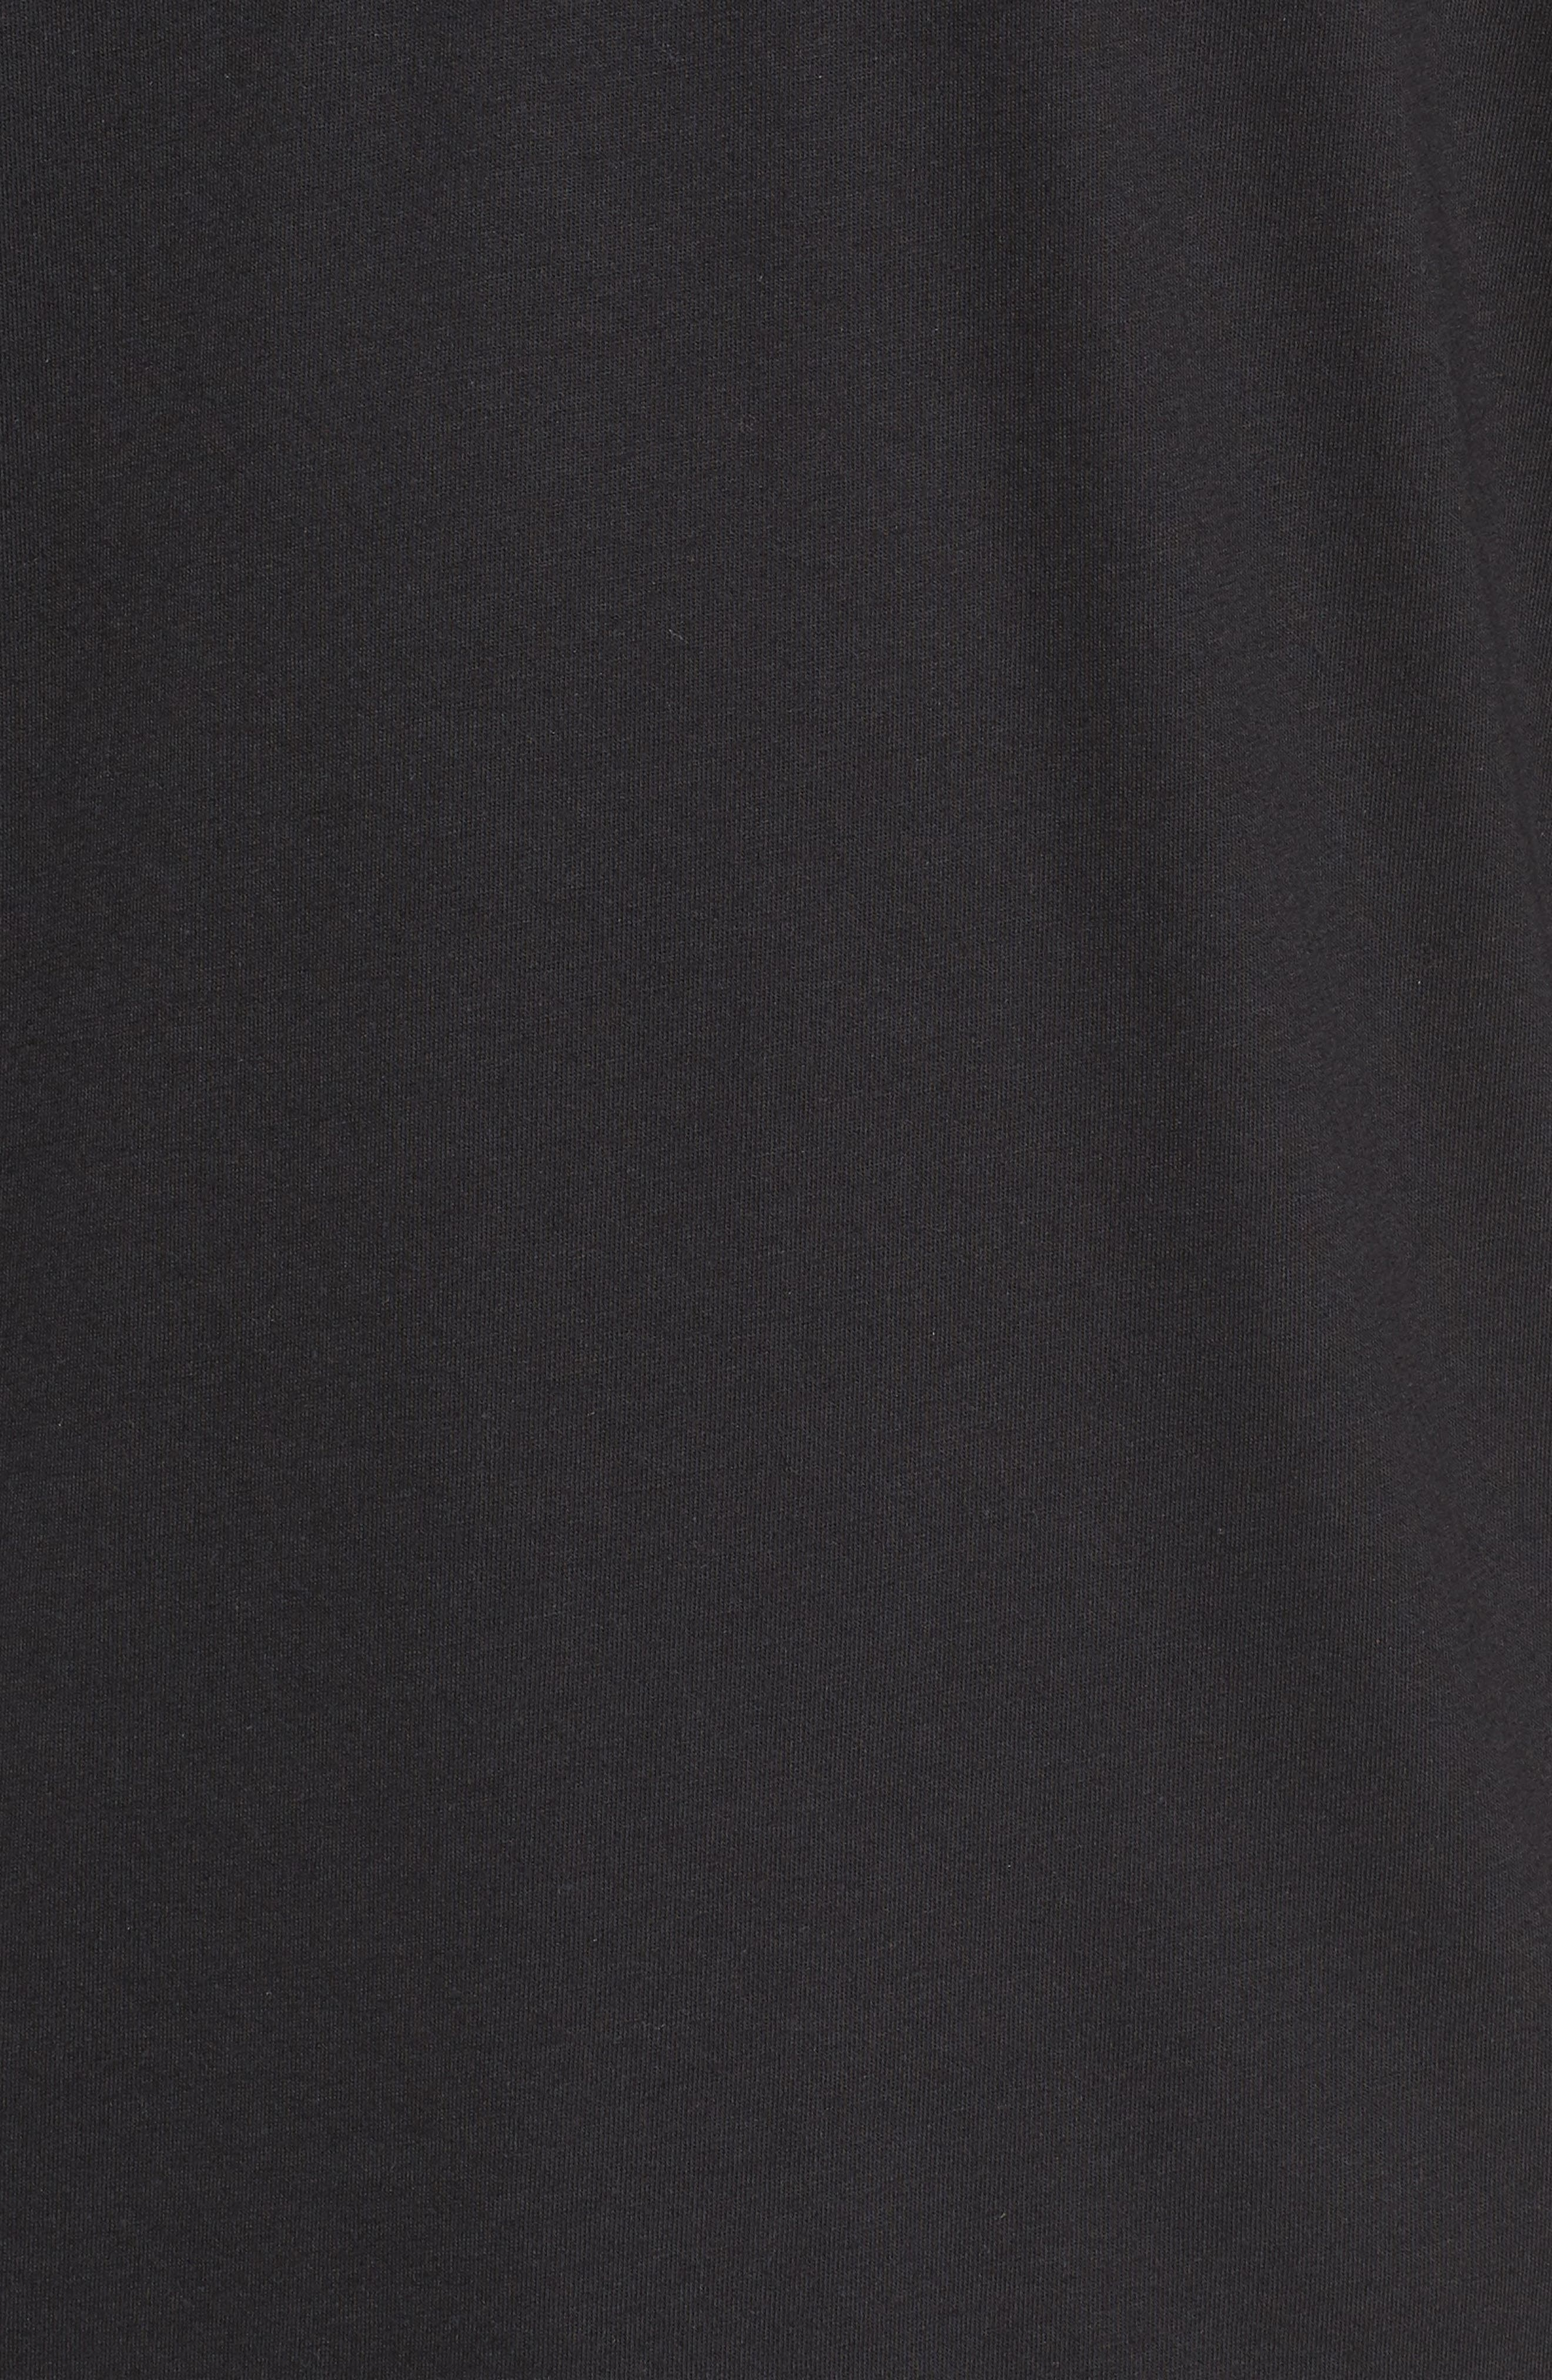 Double Layer T-Shirt,                             Alternate thumbnail 5, color,                             Black/ White